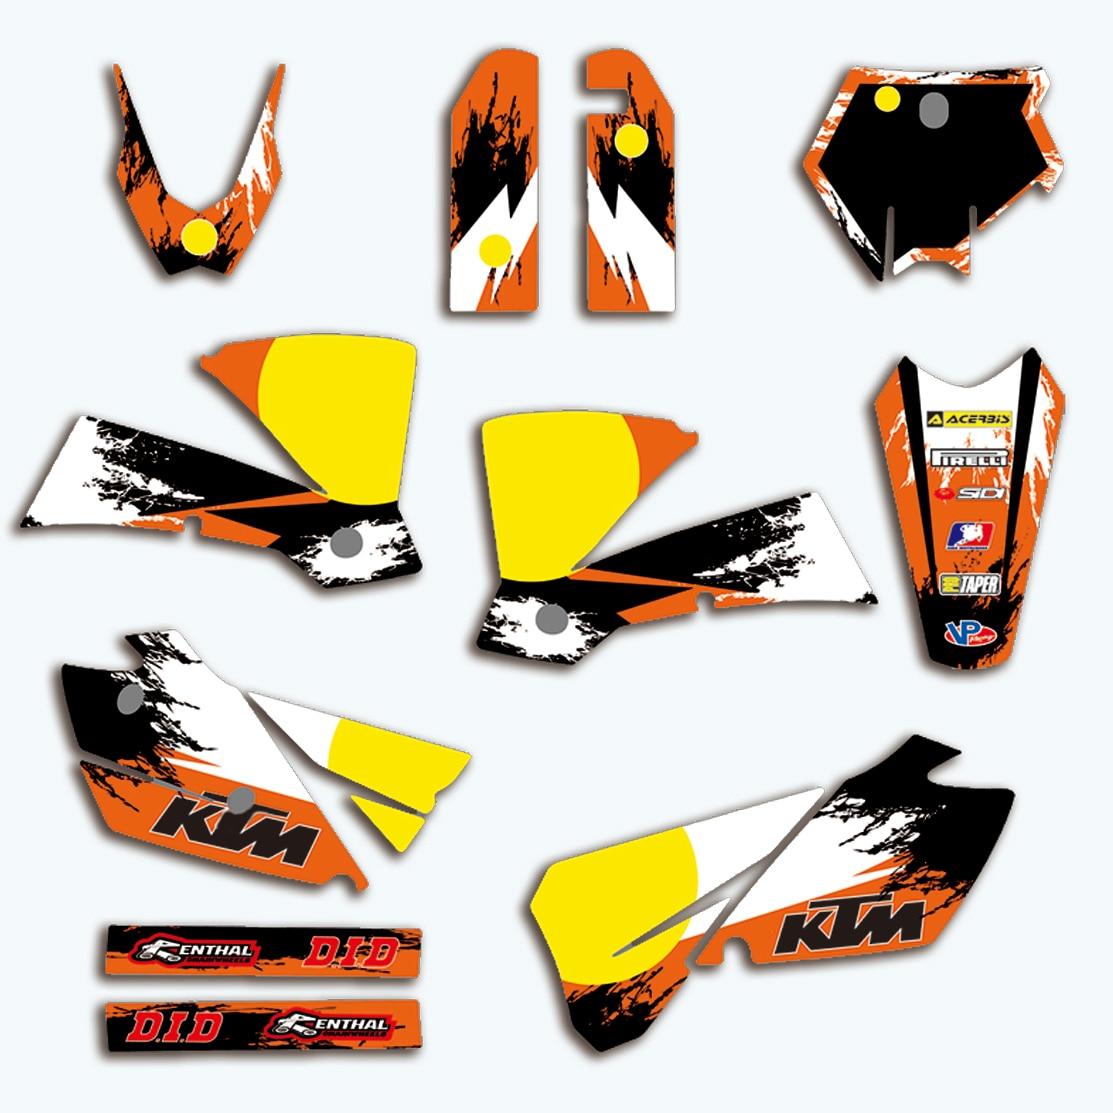 Adesivo decalque Da Motocicleta Para KTM SX 125 150 200 250 300 350 400 450 525 2003 2004 Gráficos Fundos Adesivos Acessórios